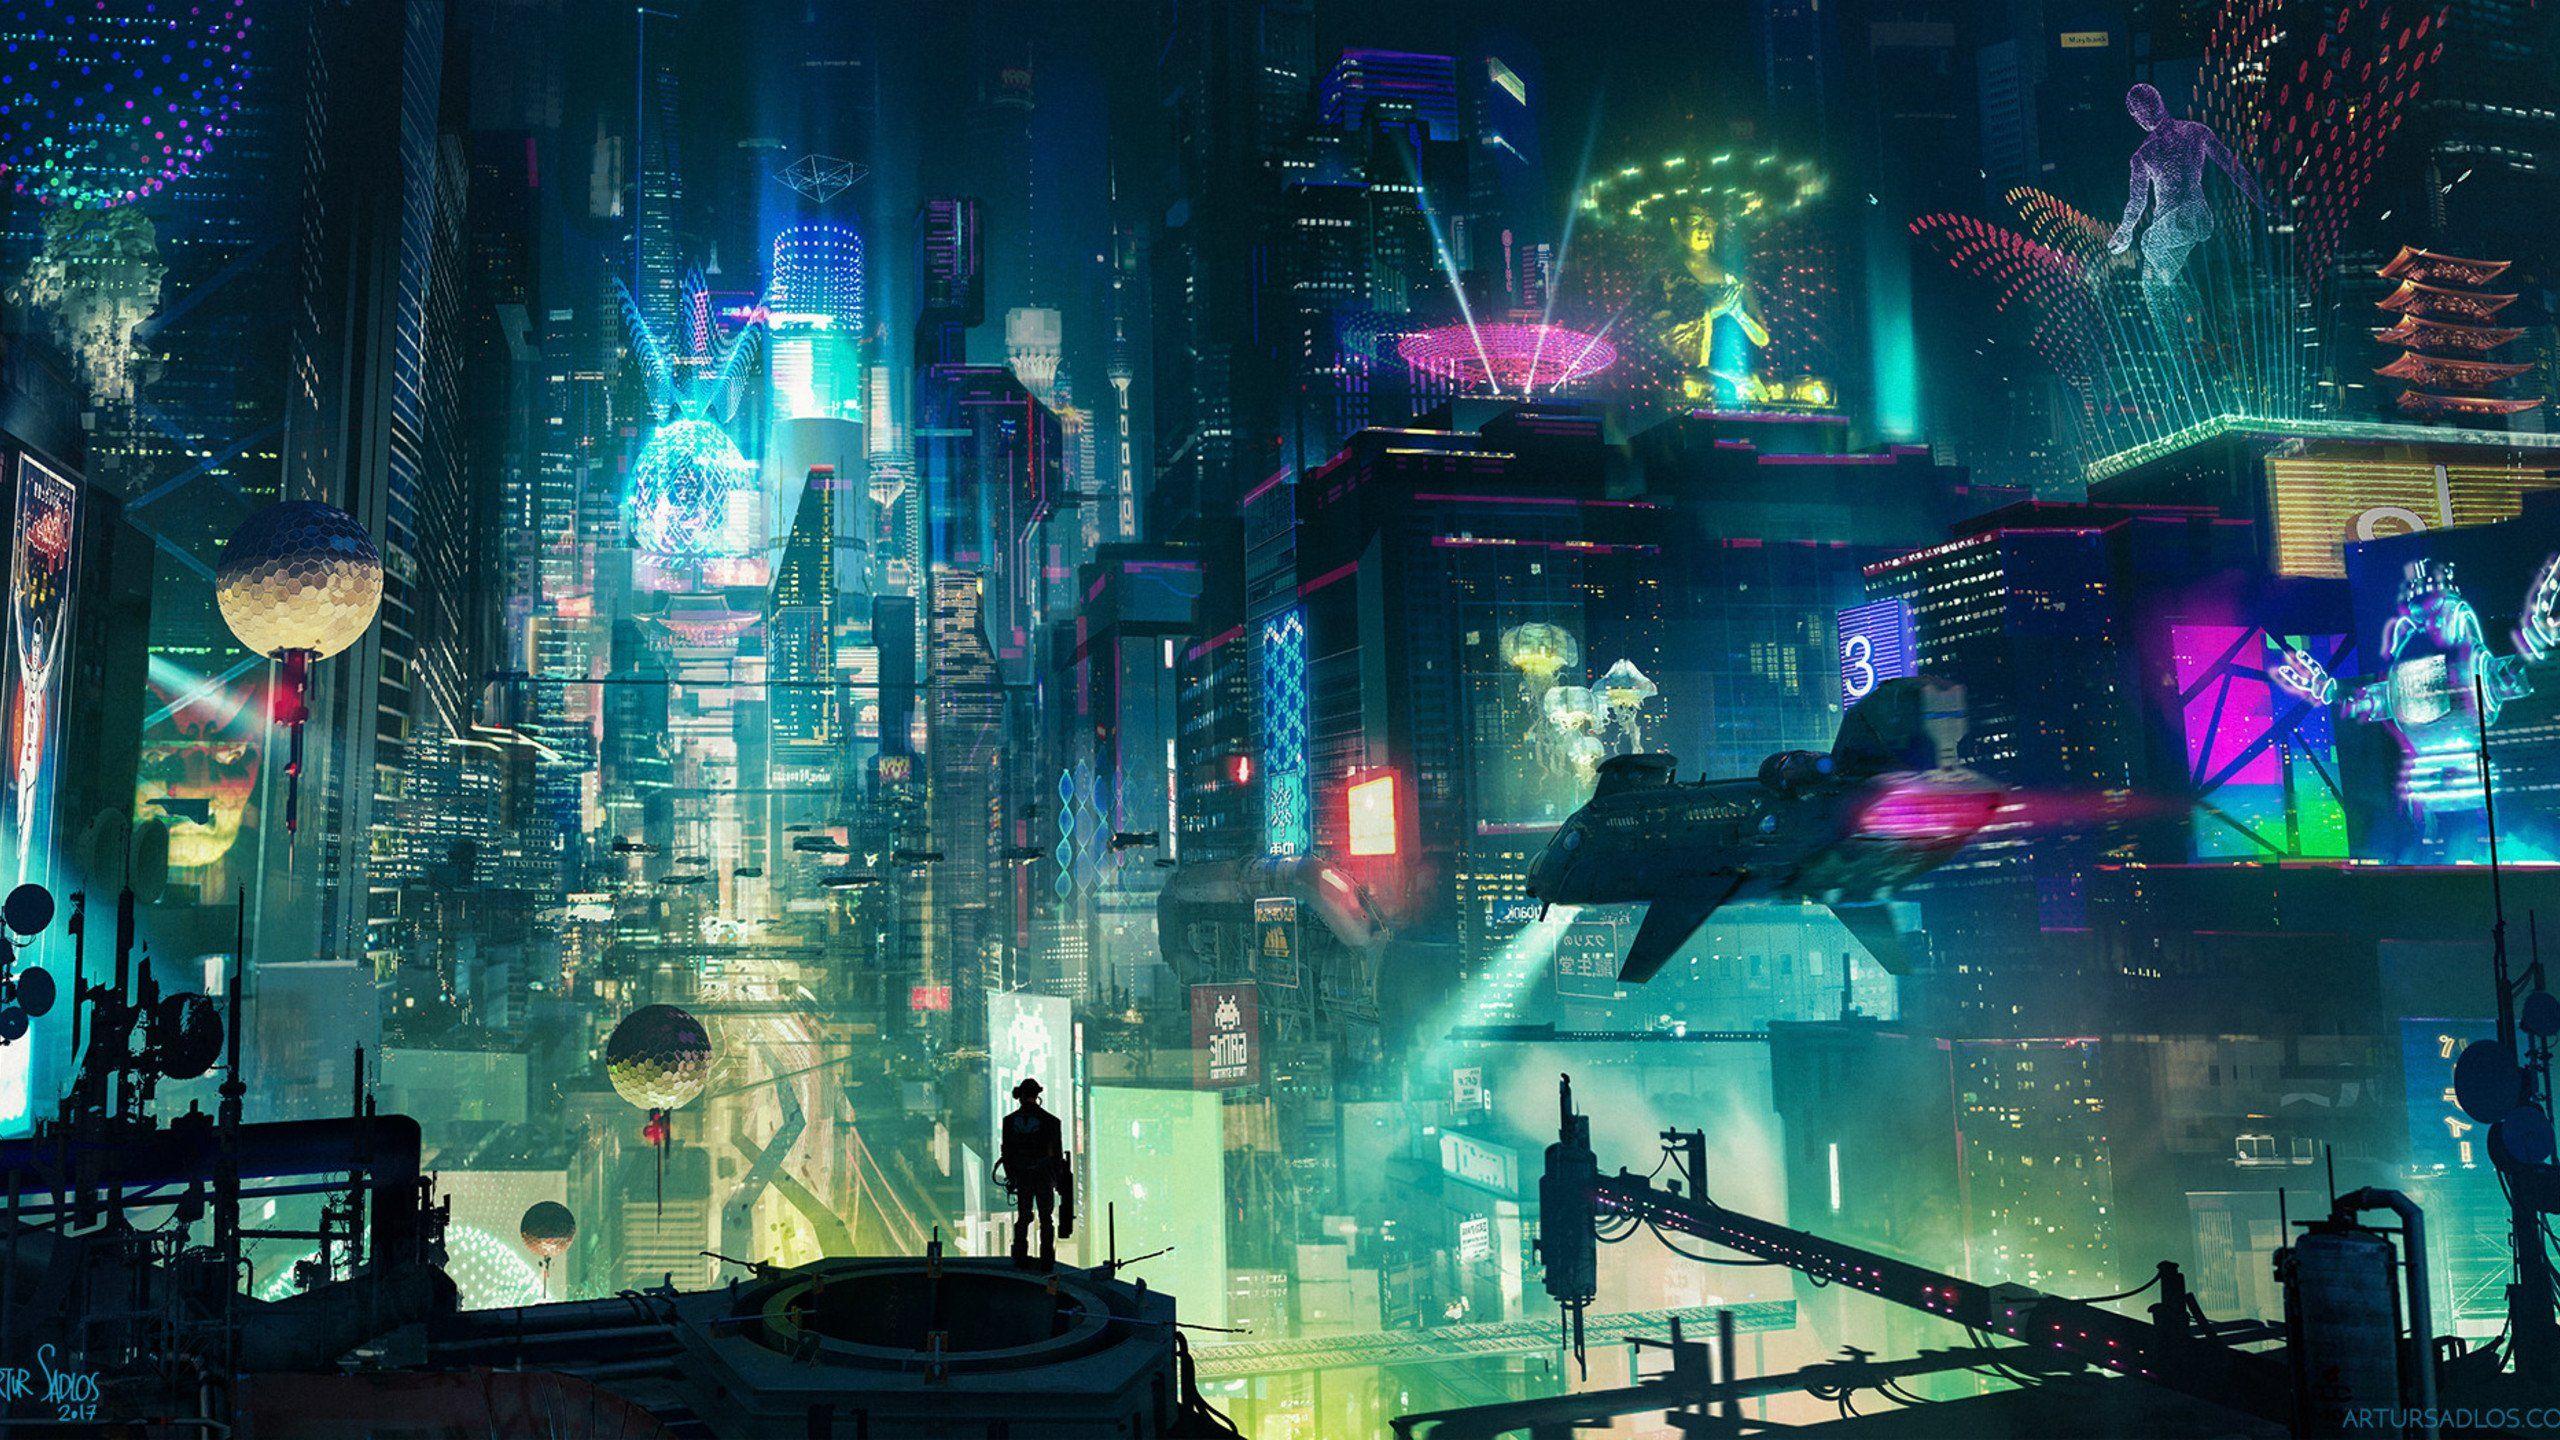 Cyberpunk City Wallpaper Futuristic City Cyberpunk City Cyberpunk Aesthetic